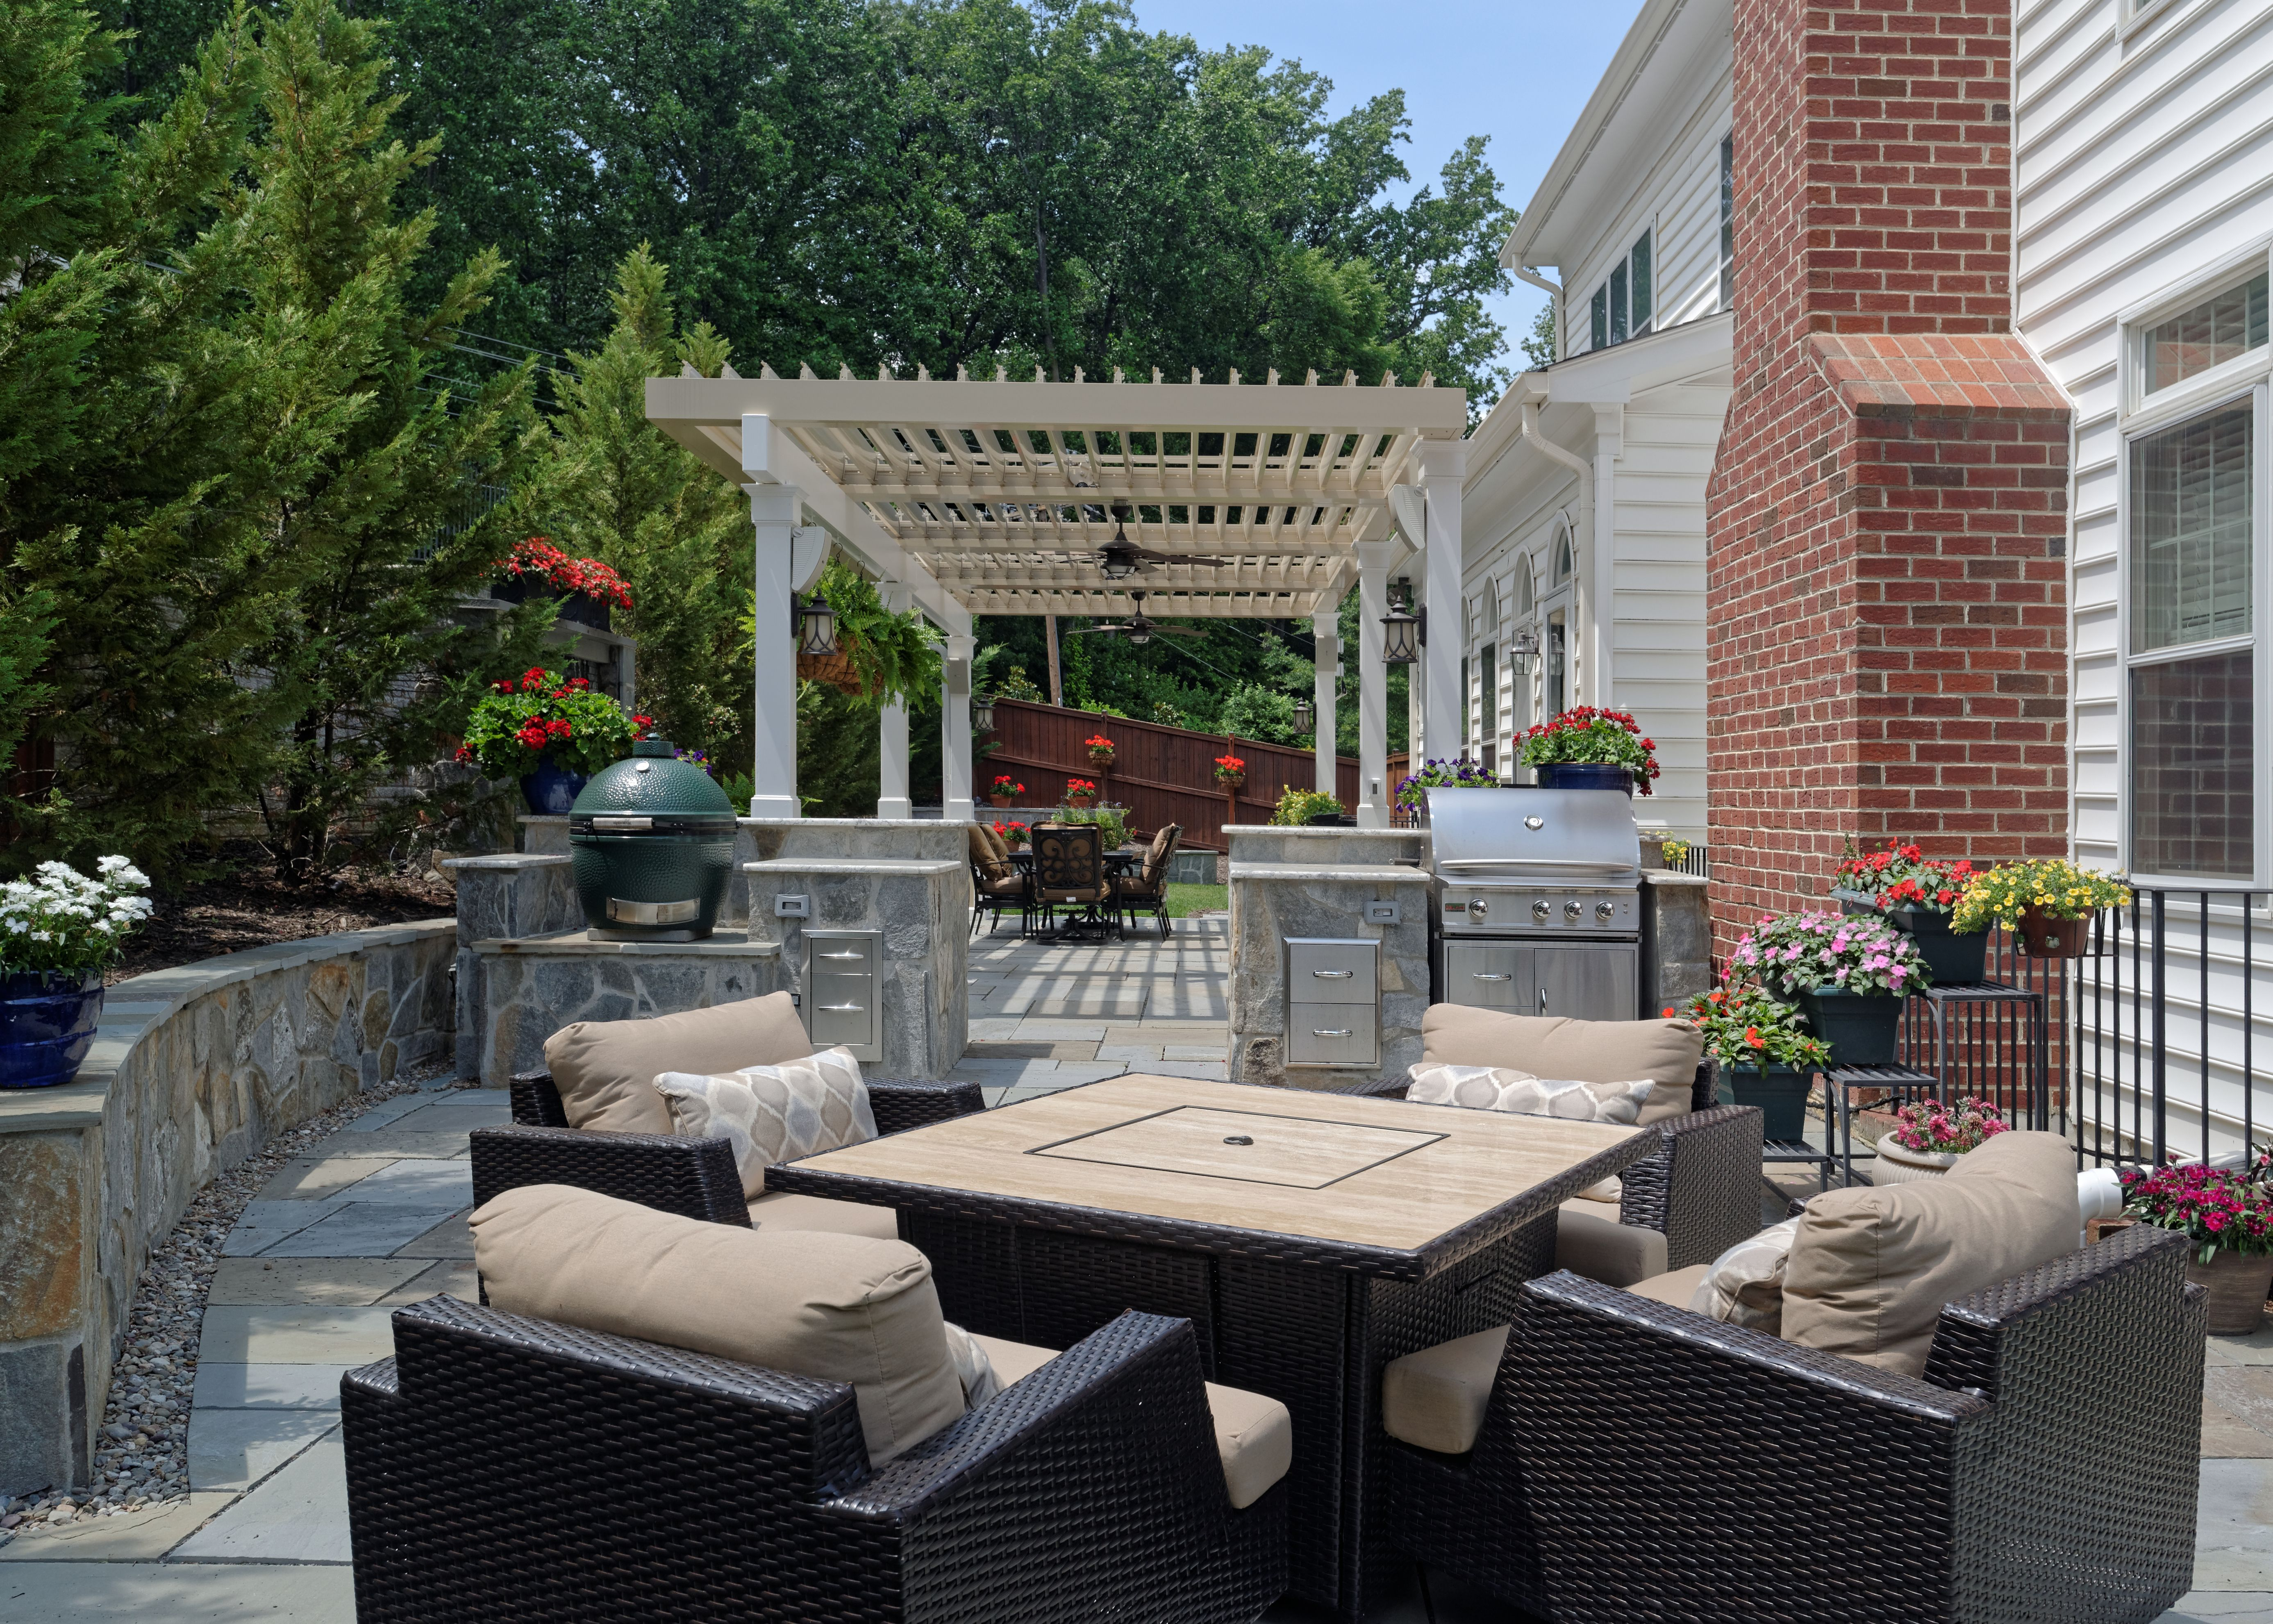 Home | Pergola plans roofs, Patio, Pergola on the roof